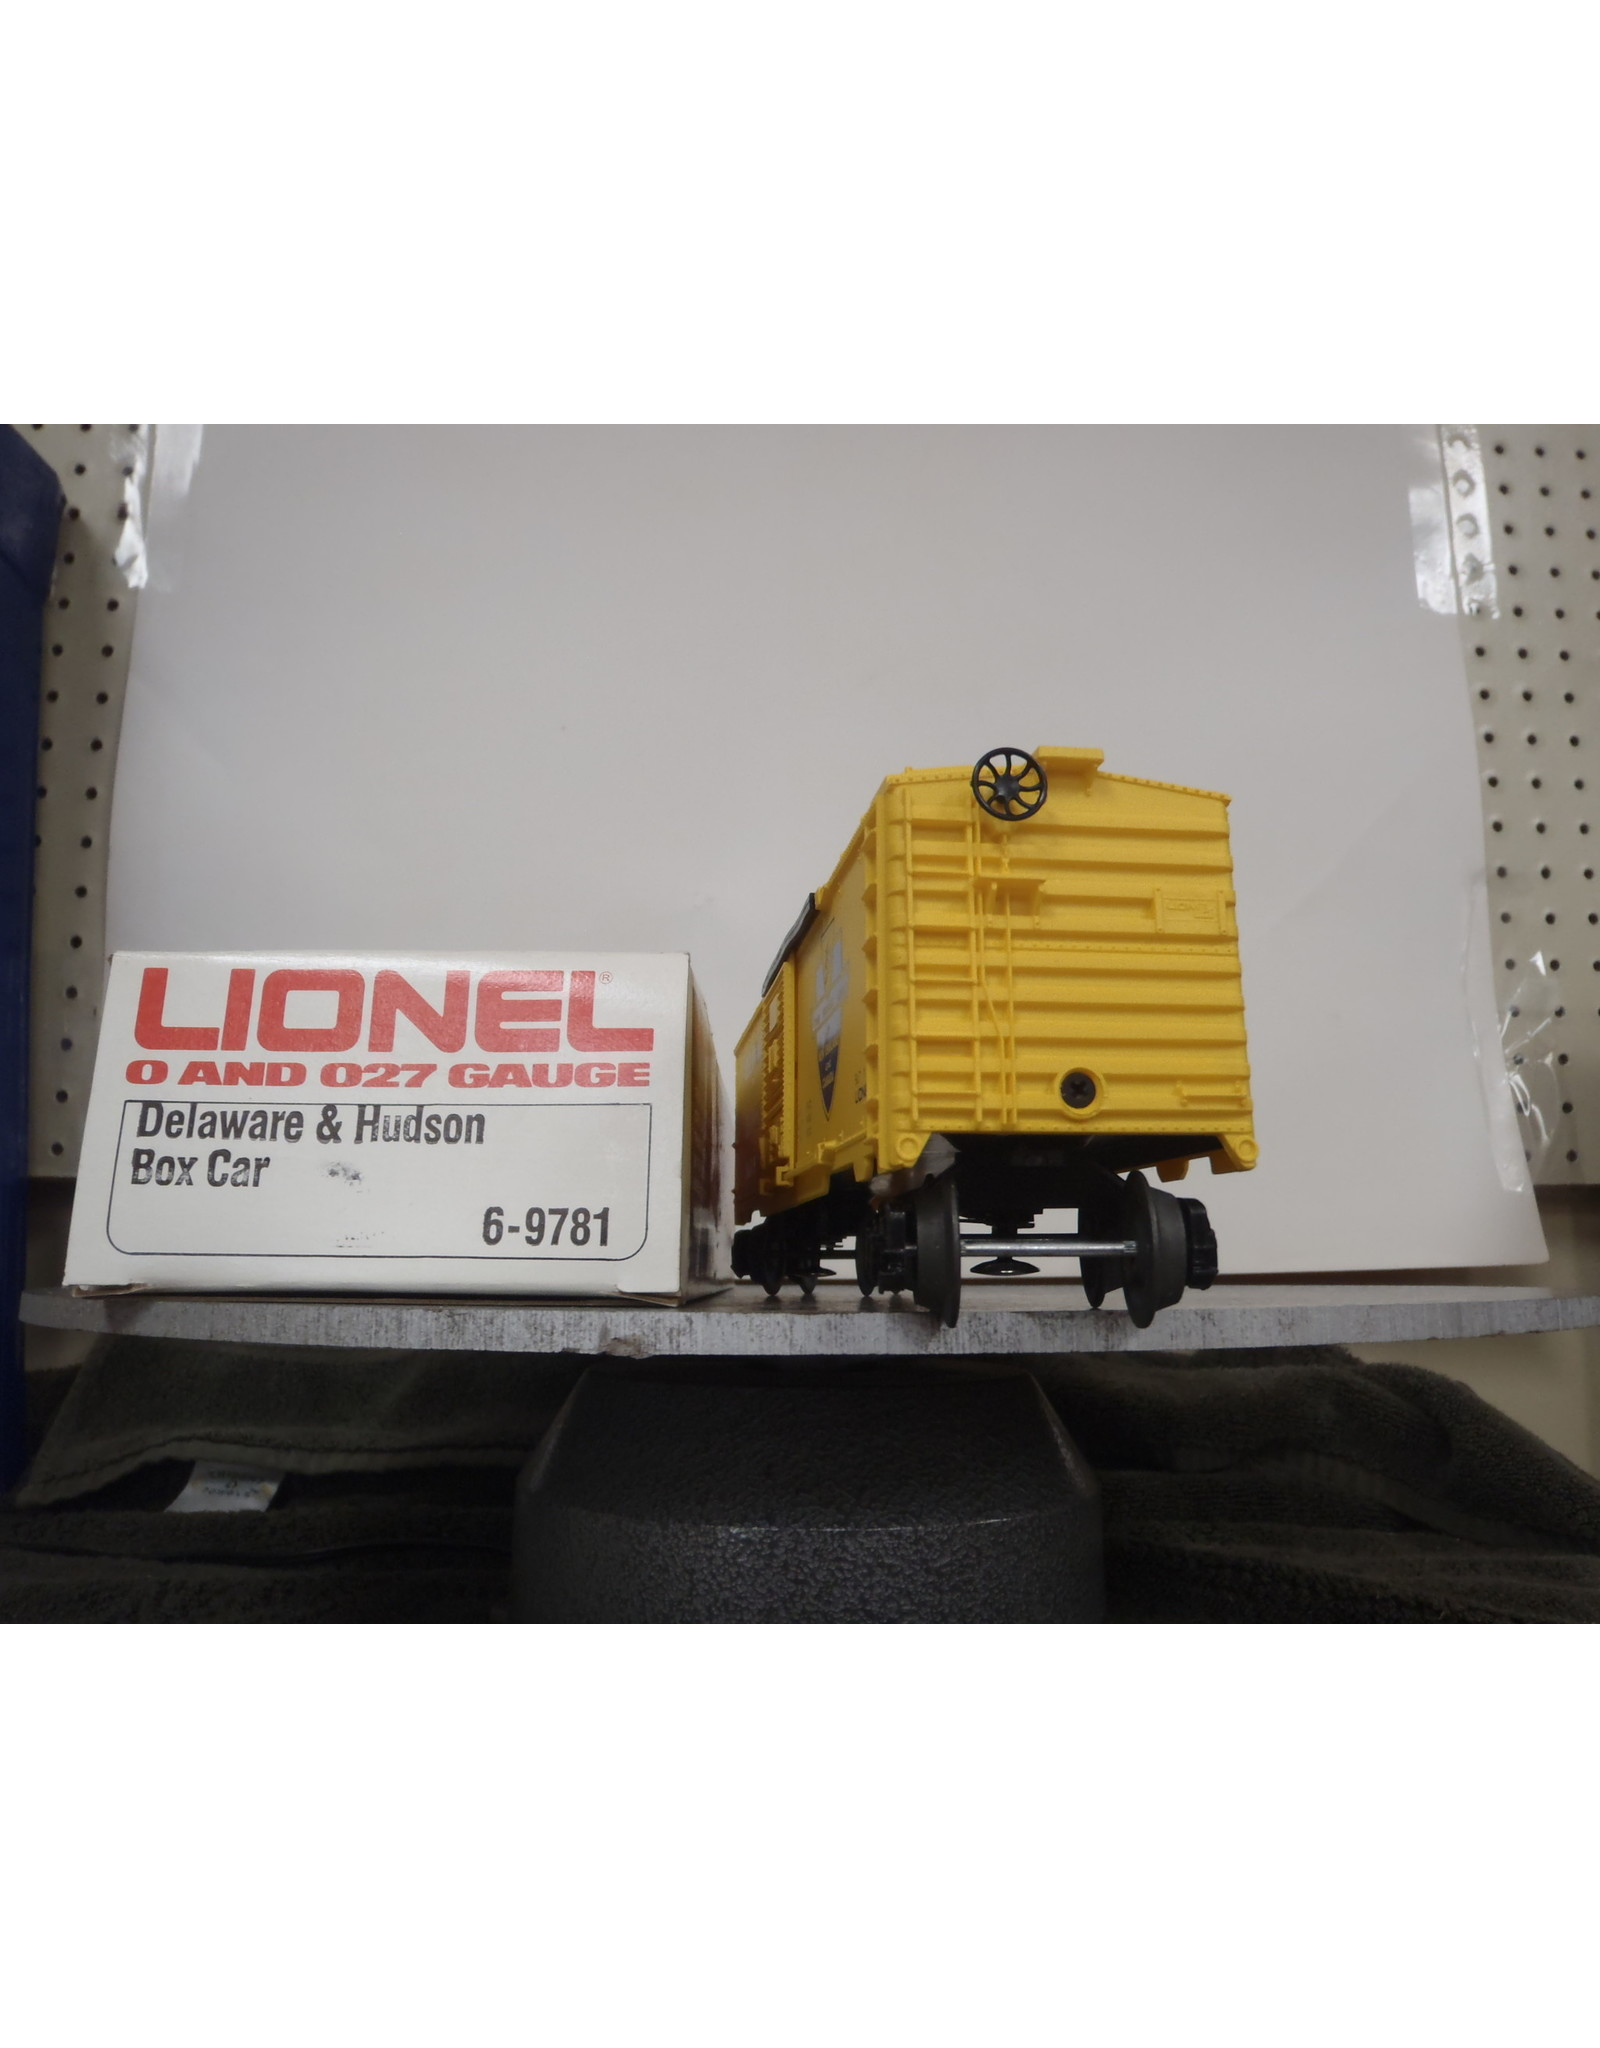 Lionel Boxcar Delaware and Hudson 9781